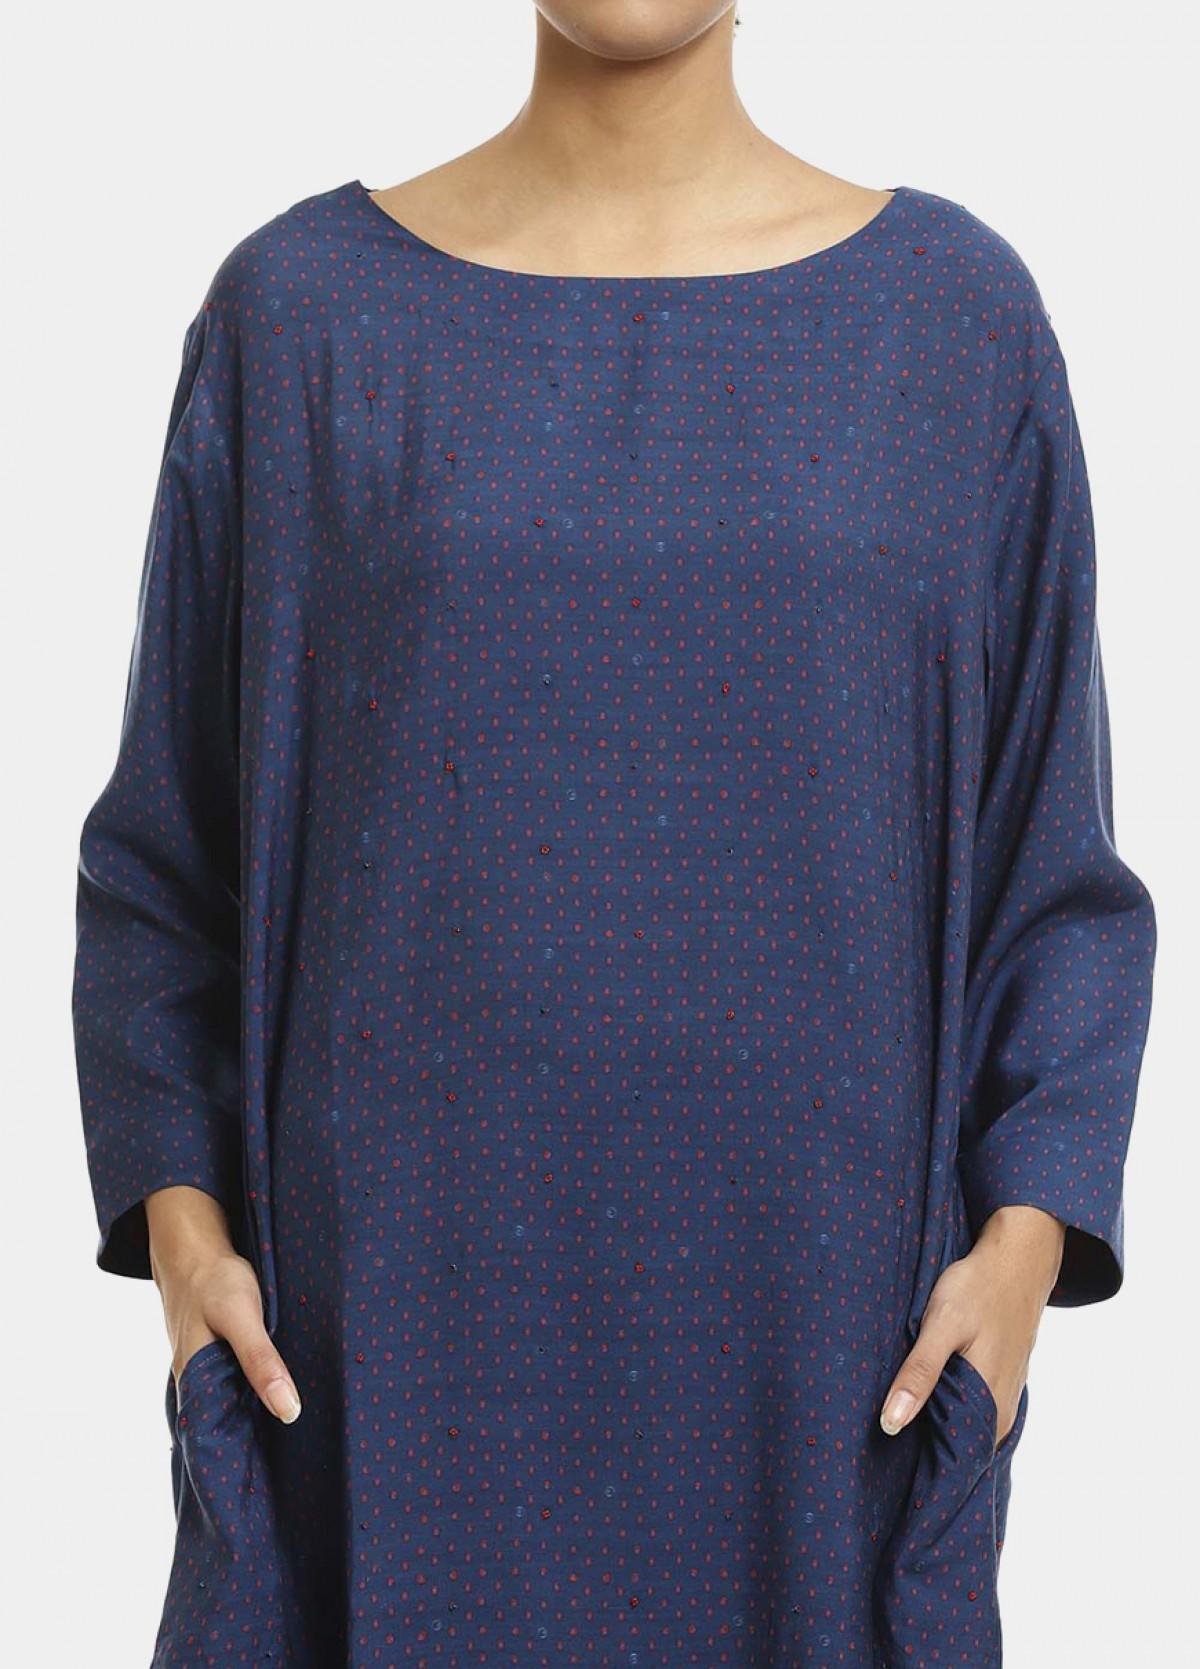 The Boond Indigo Blue Dress